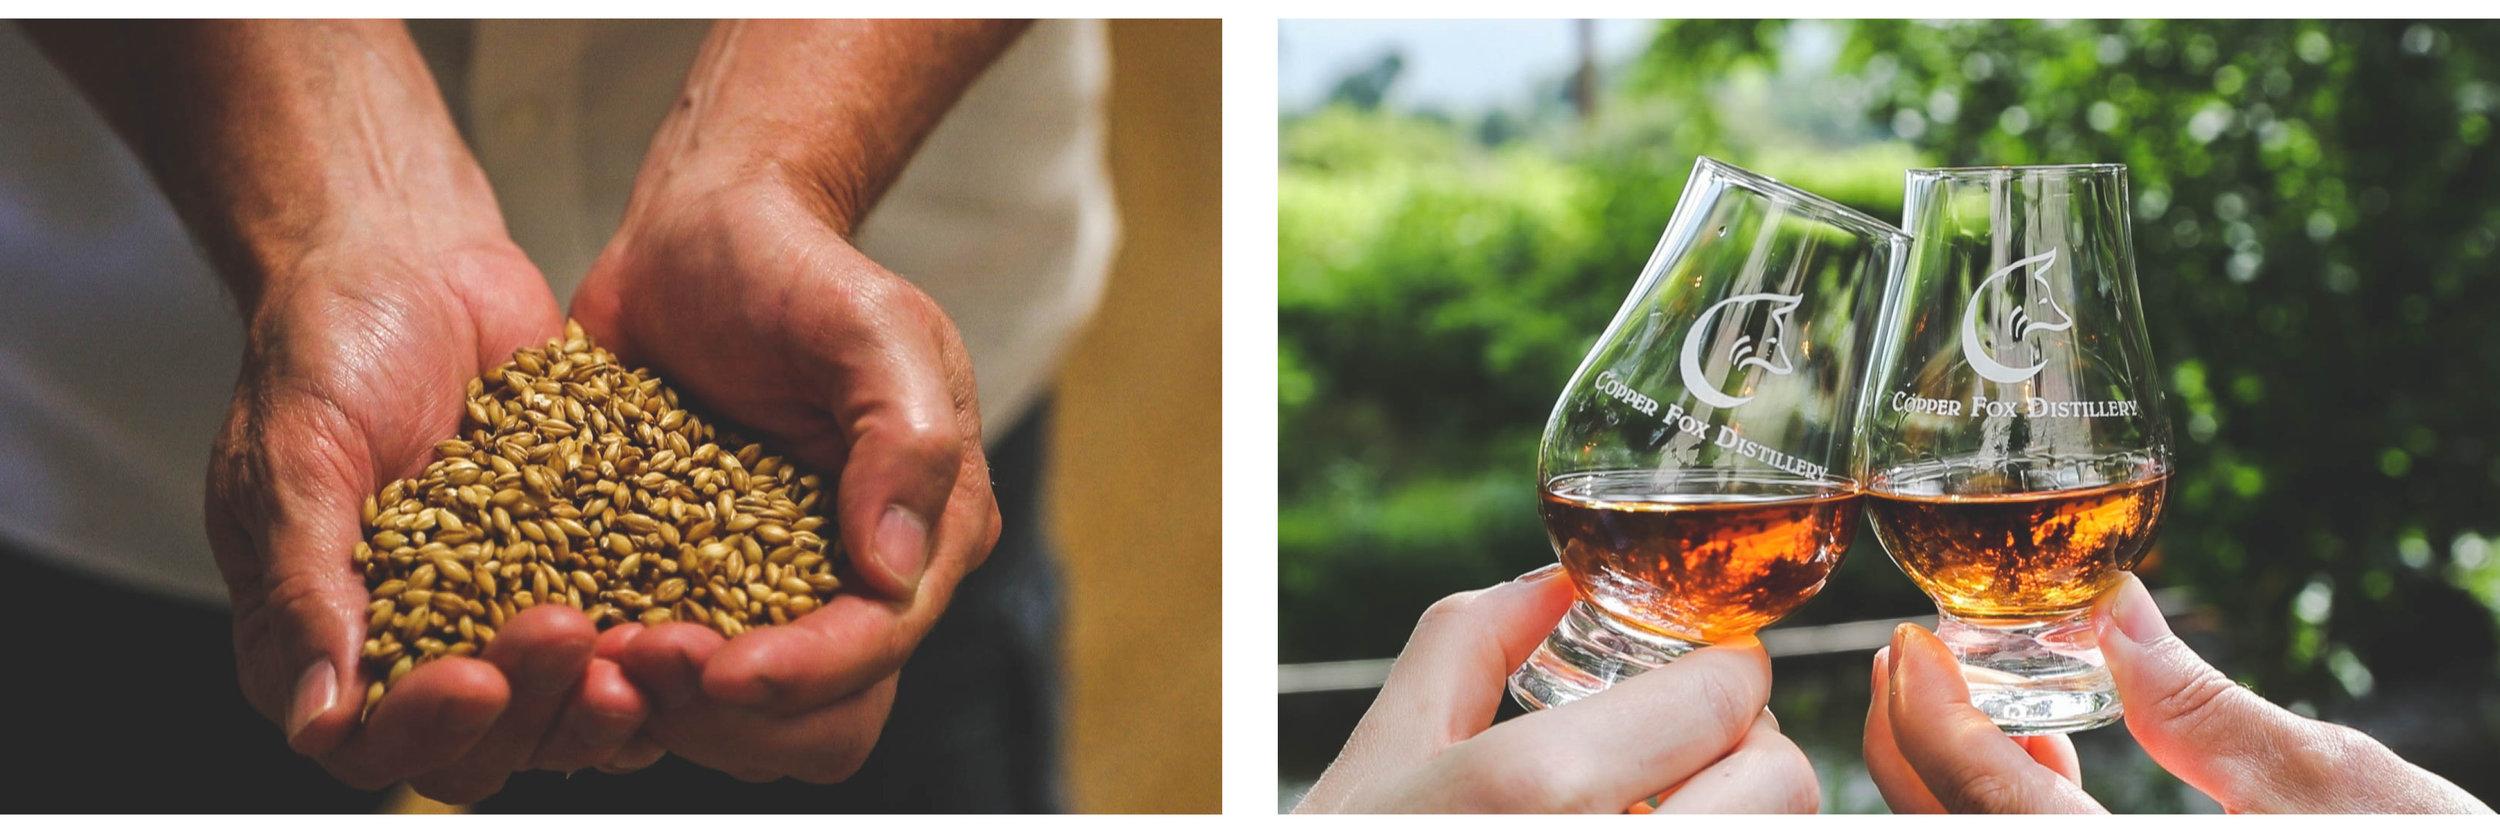 Images: Copper Fox Distillery - Dan Currier